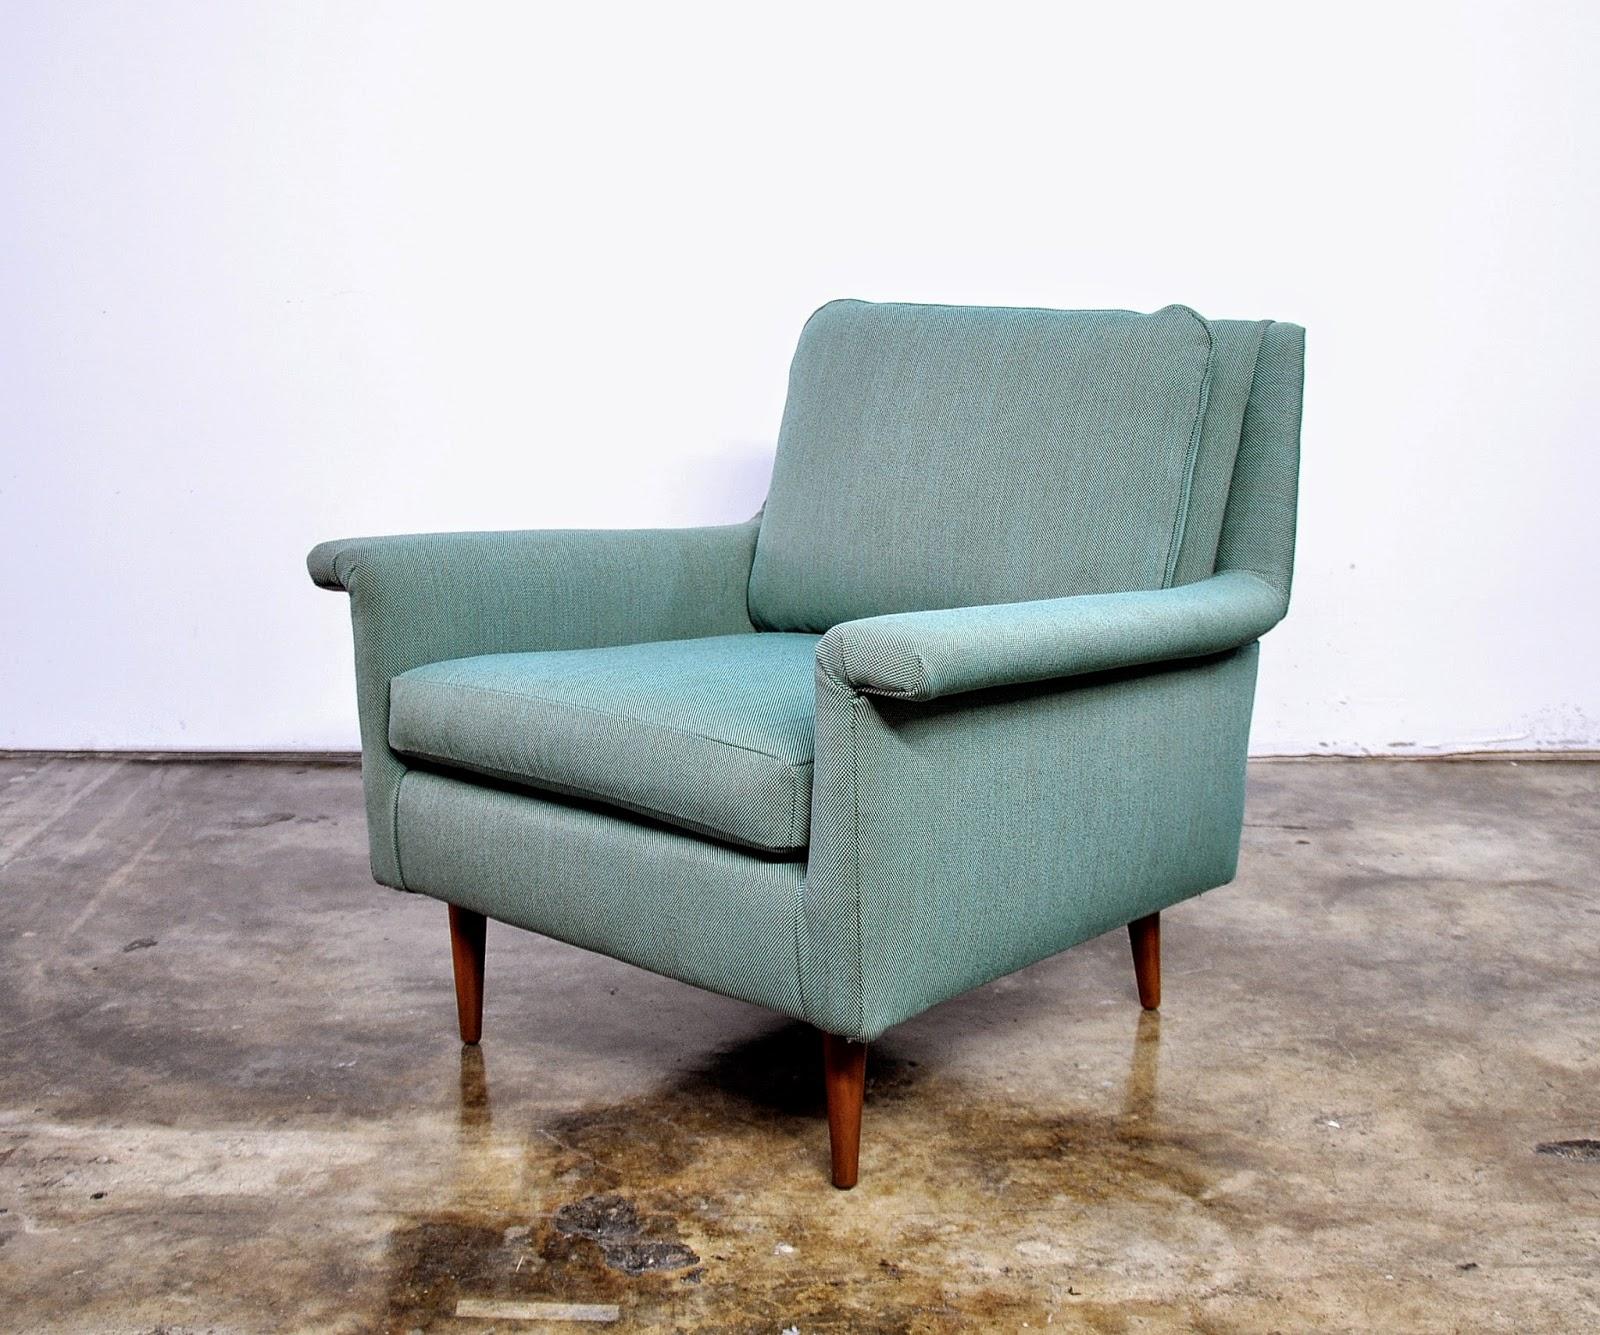 Select Modern Milo Baughman Club Or Lounge Chair